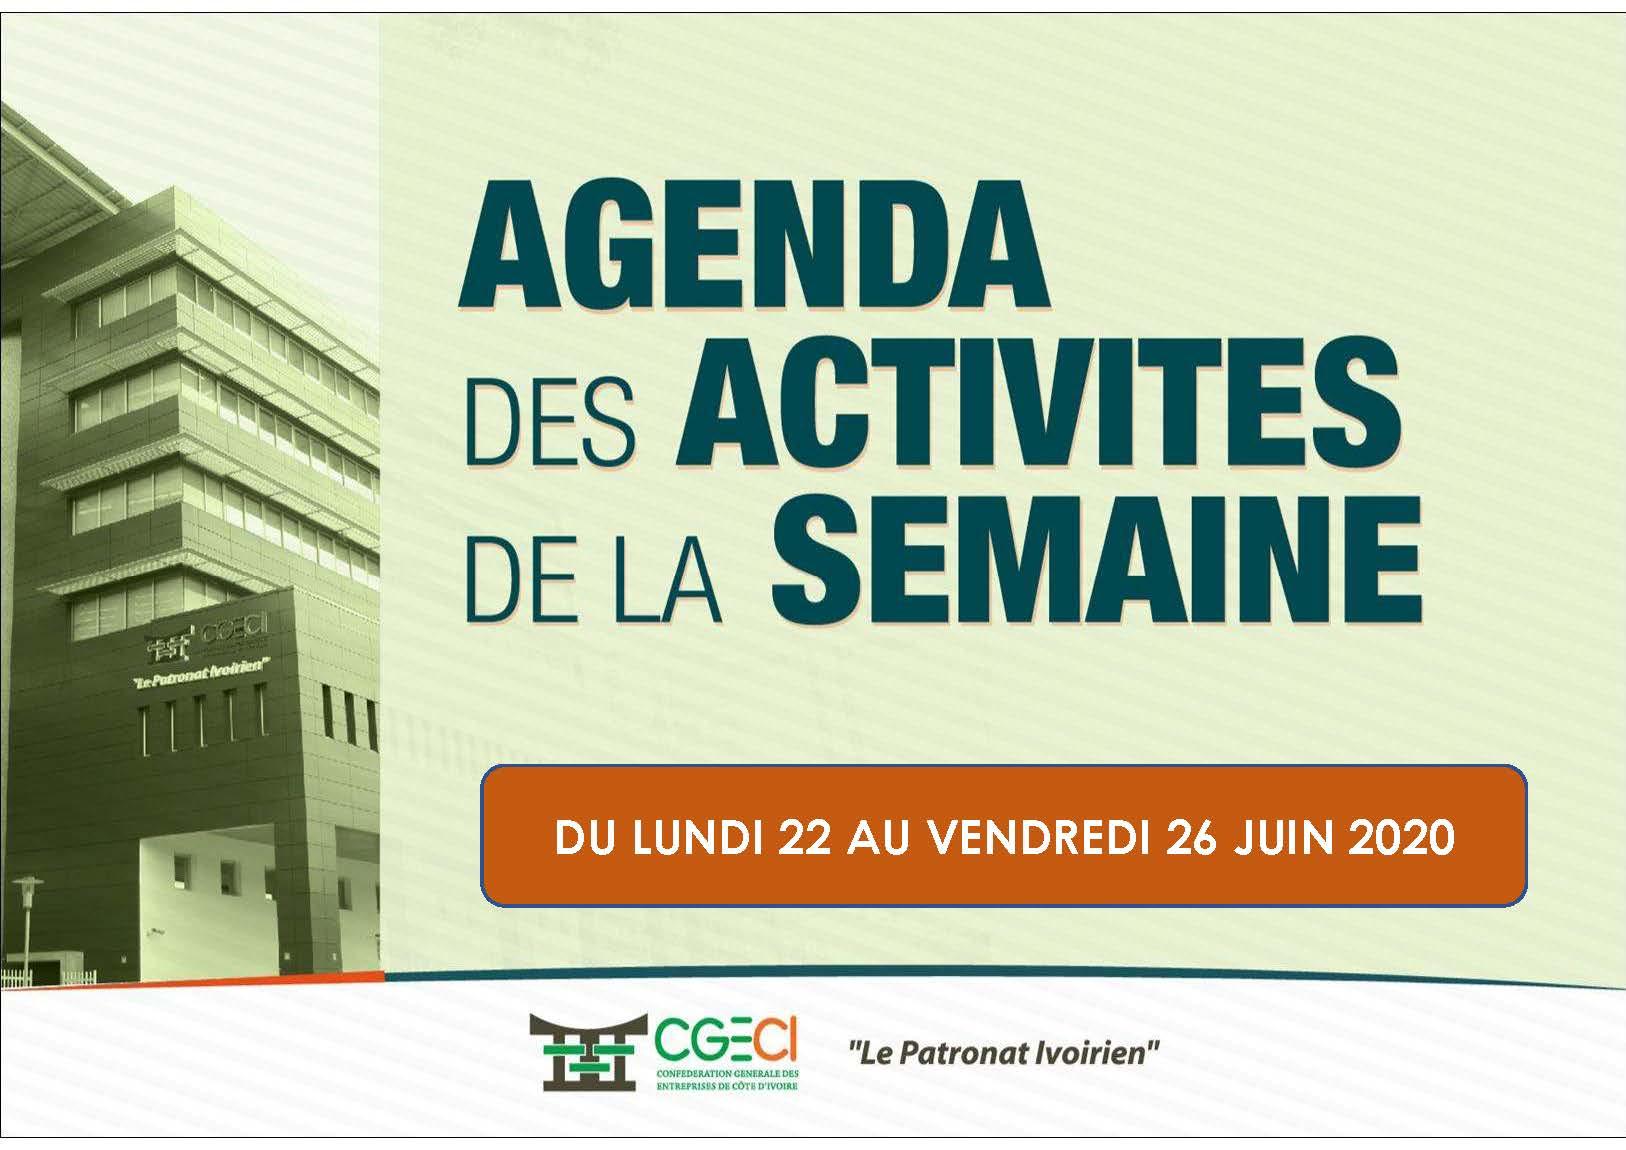 AGENDA DE LA SEMAINE DU 22 AU 26 JUIN 2020